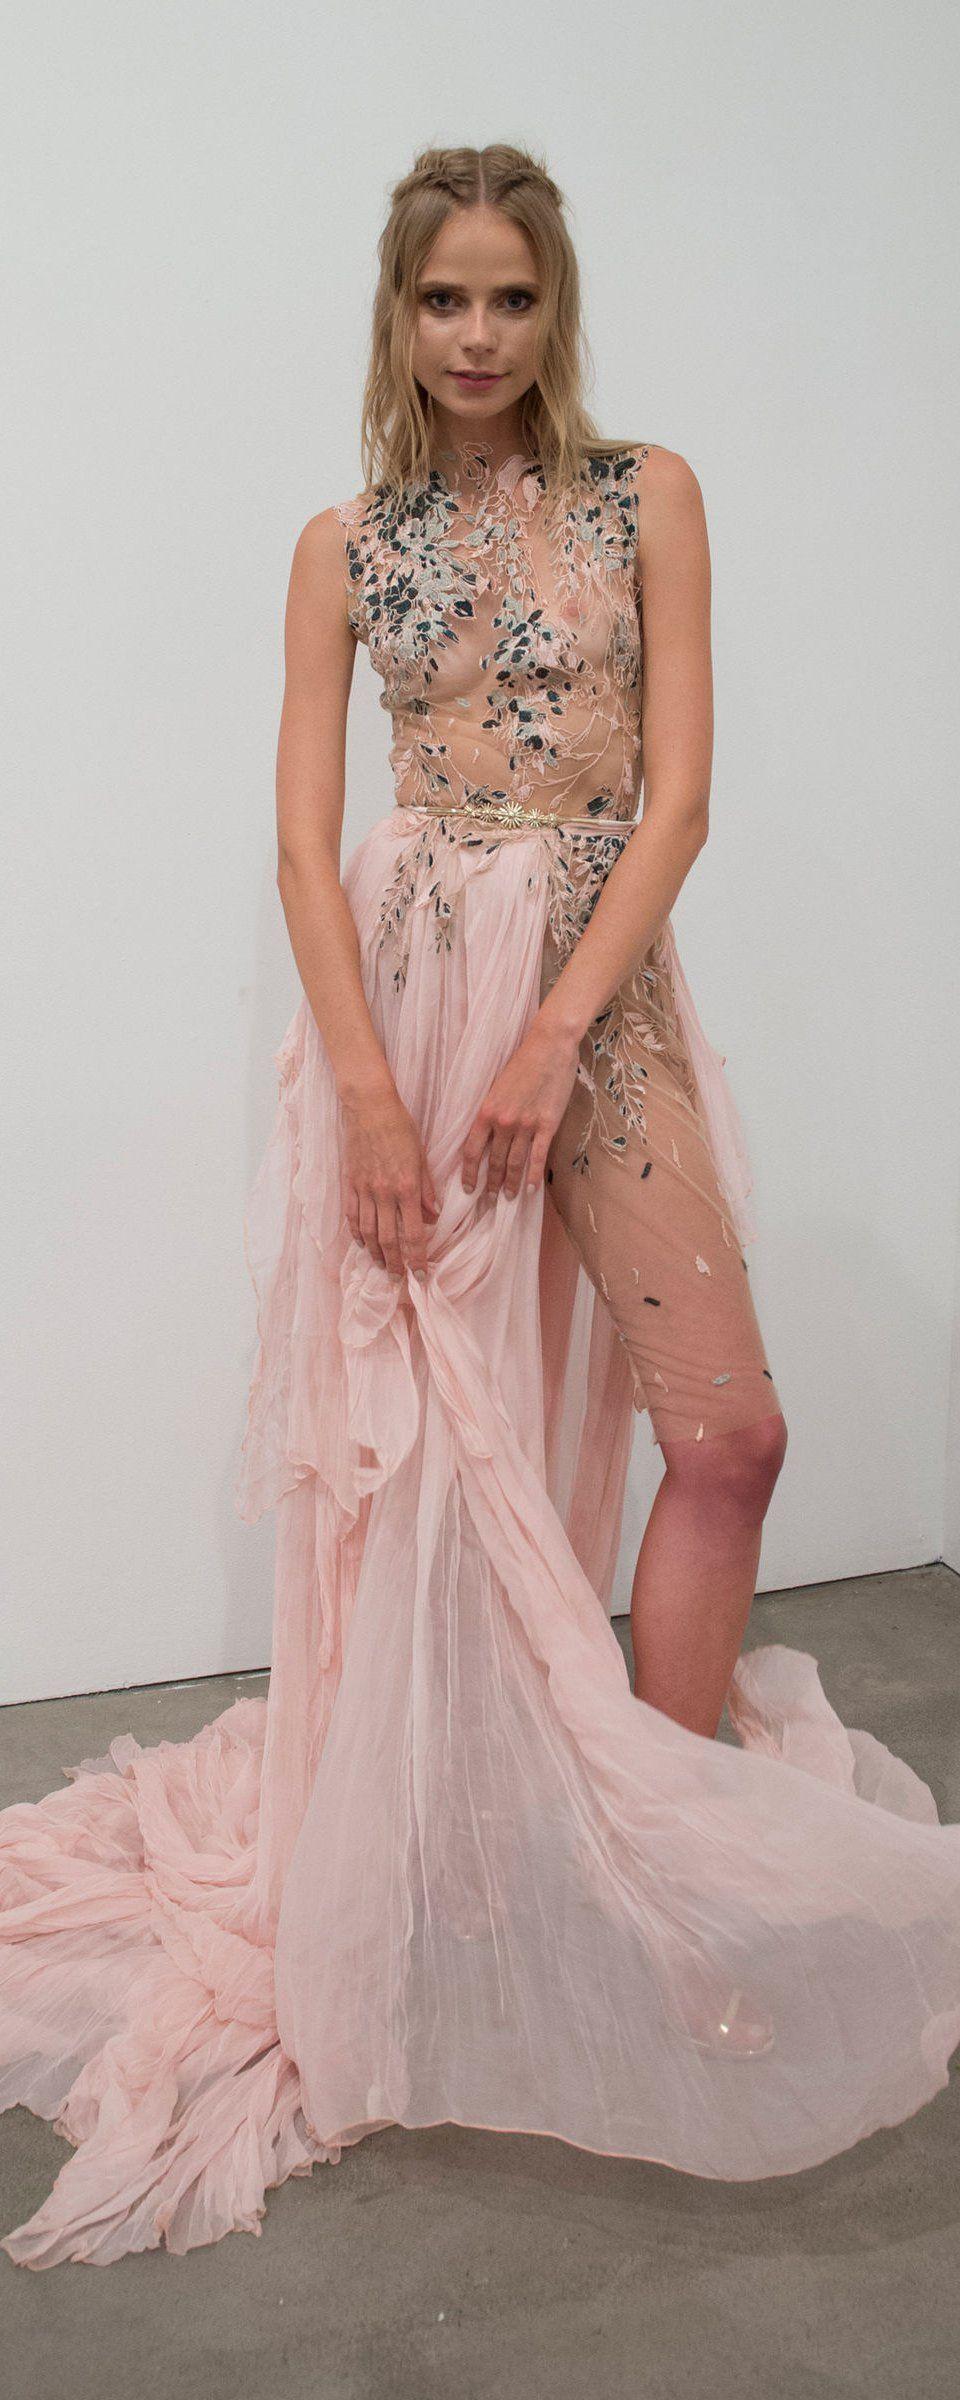 Lujo Vestido De Boda Réplica Modelo - Colección de Vestidos de Boda ...